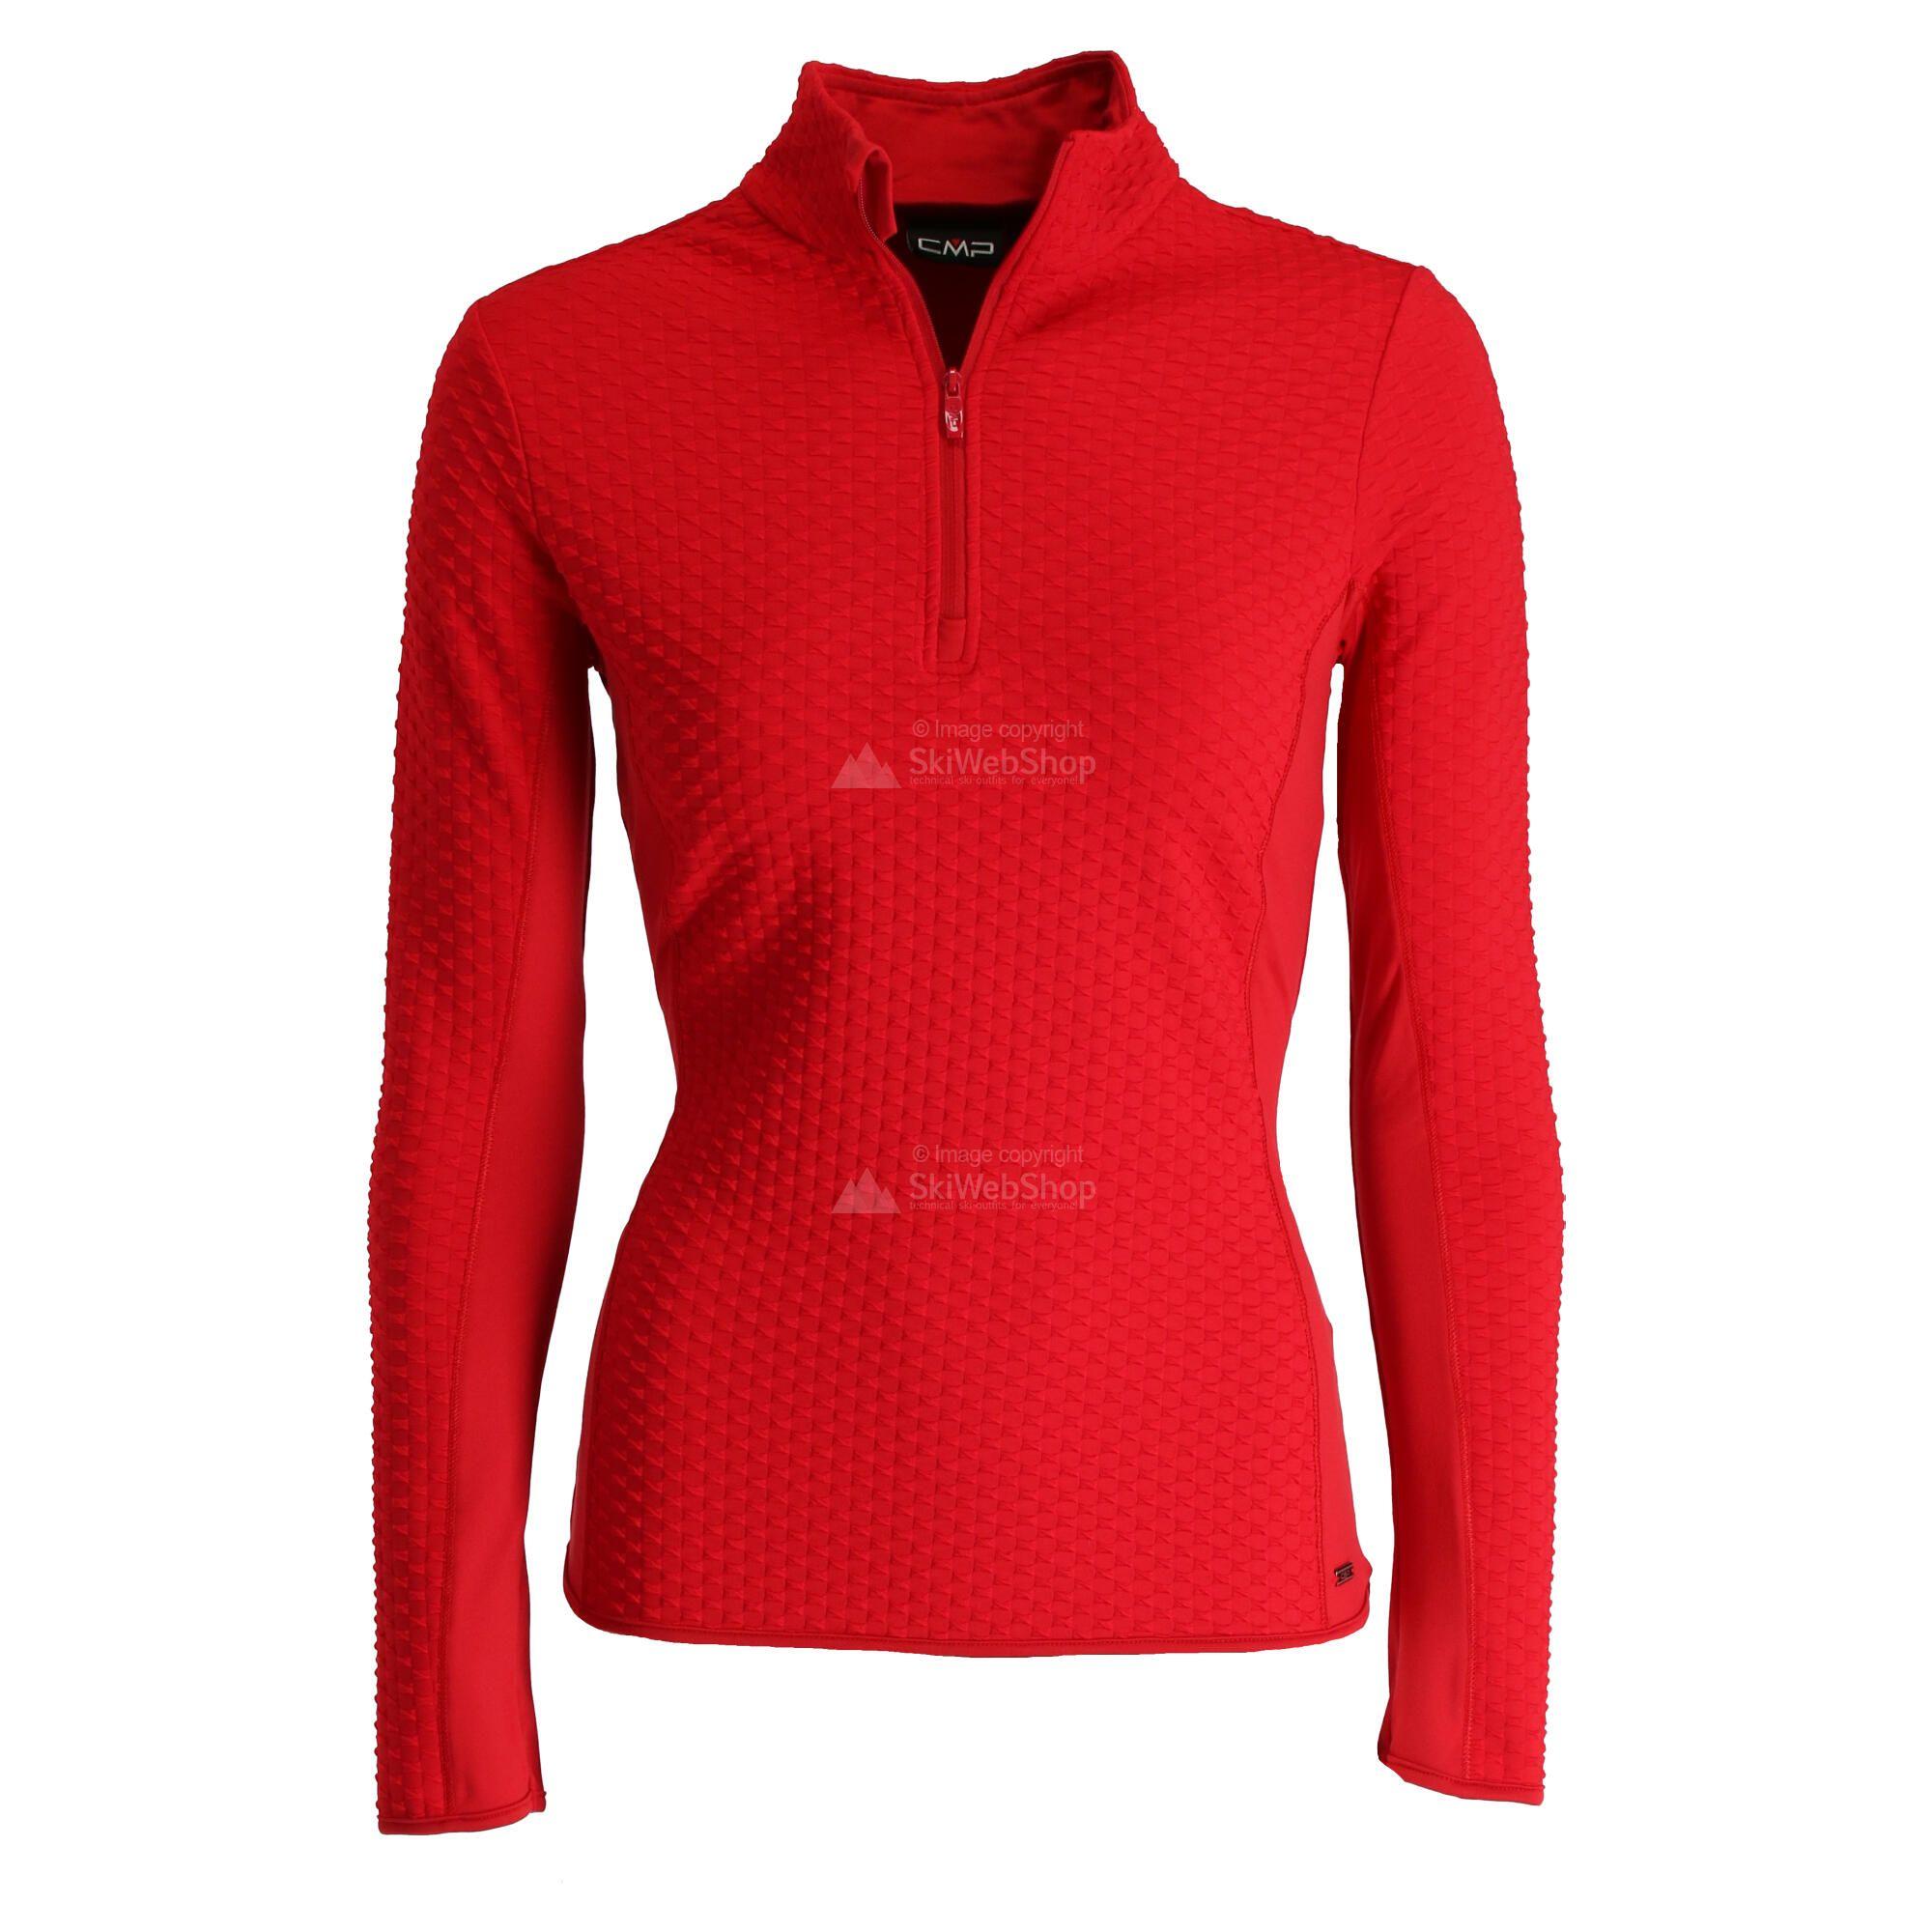 Cmp Half Zip Shirt Pullover Women Ferrari Red Skiwebshopskiwebshop Com